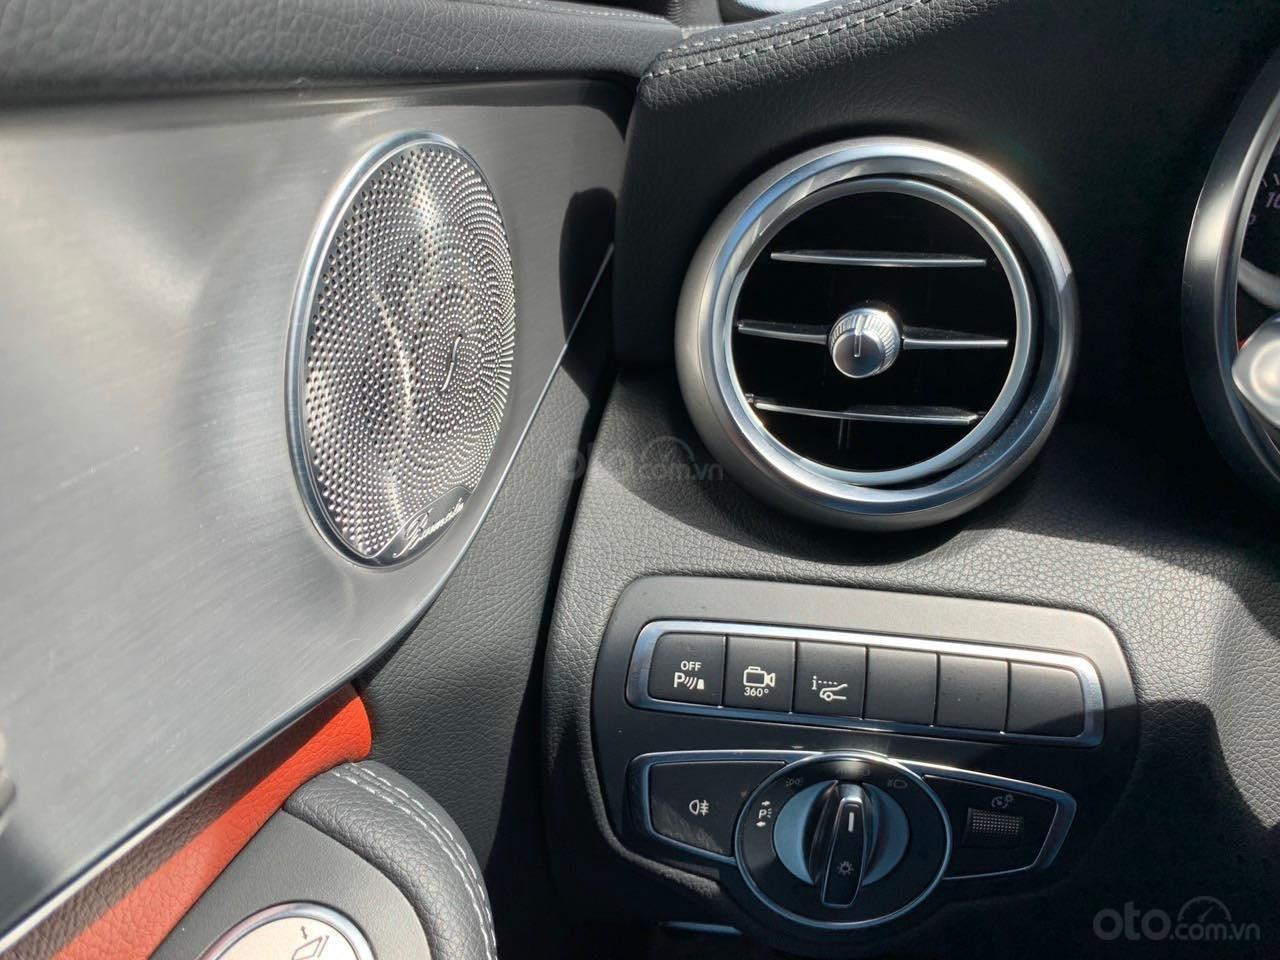 Merc C300 AMG SX 2017 model 2018 (2)